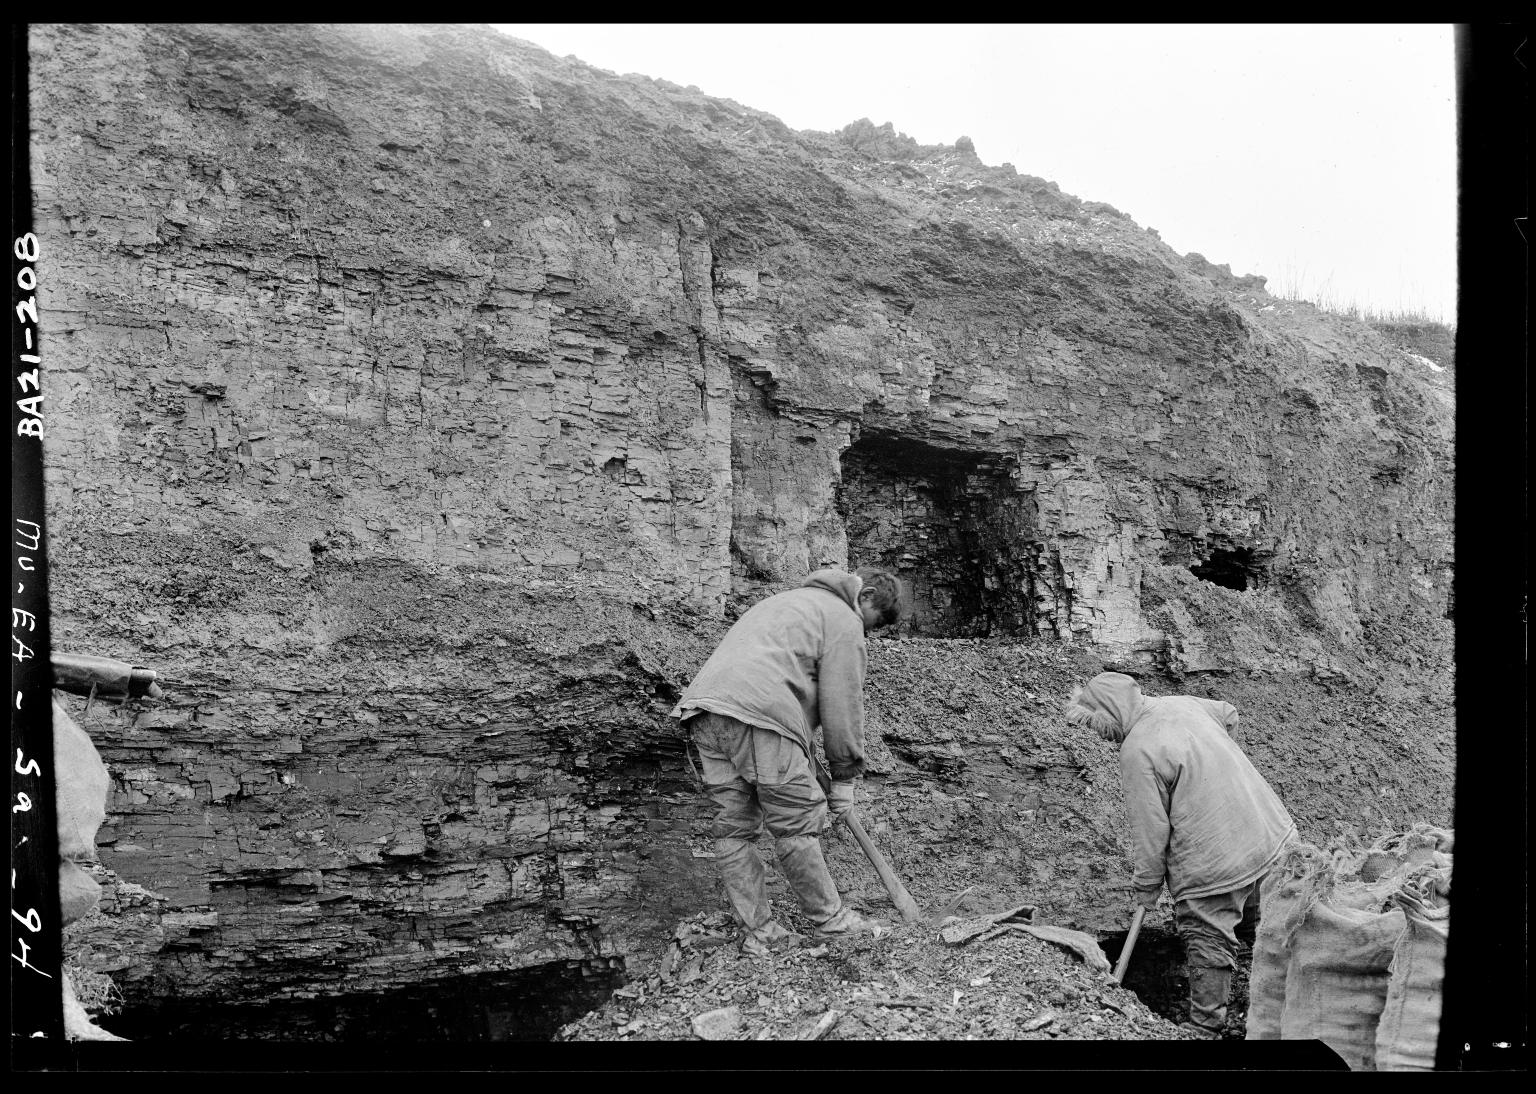 Eskimo coal miners